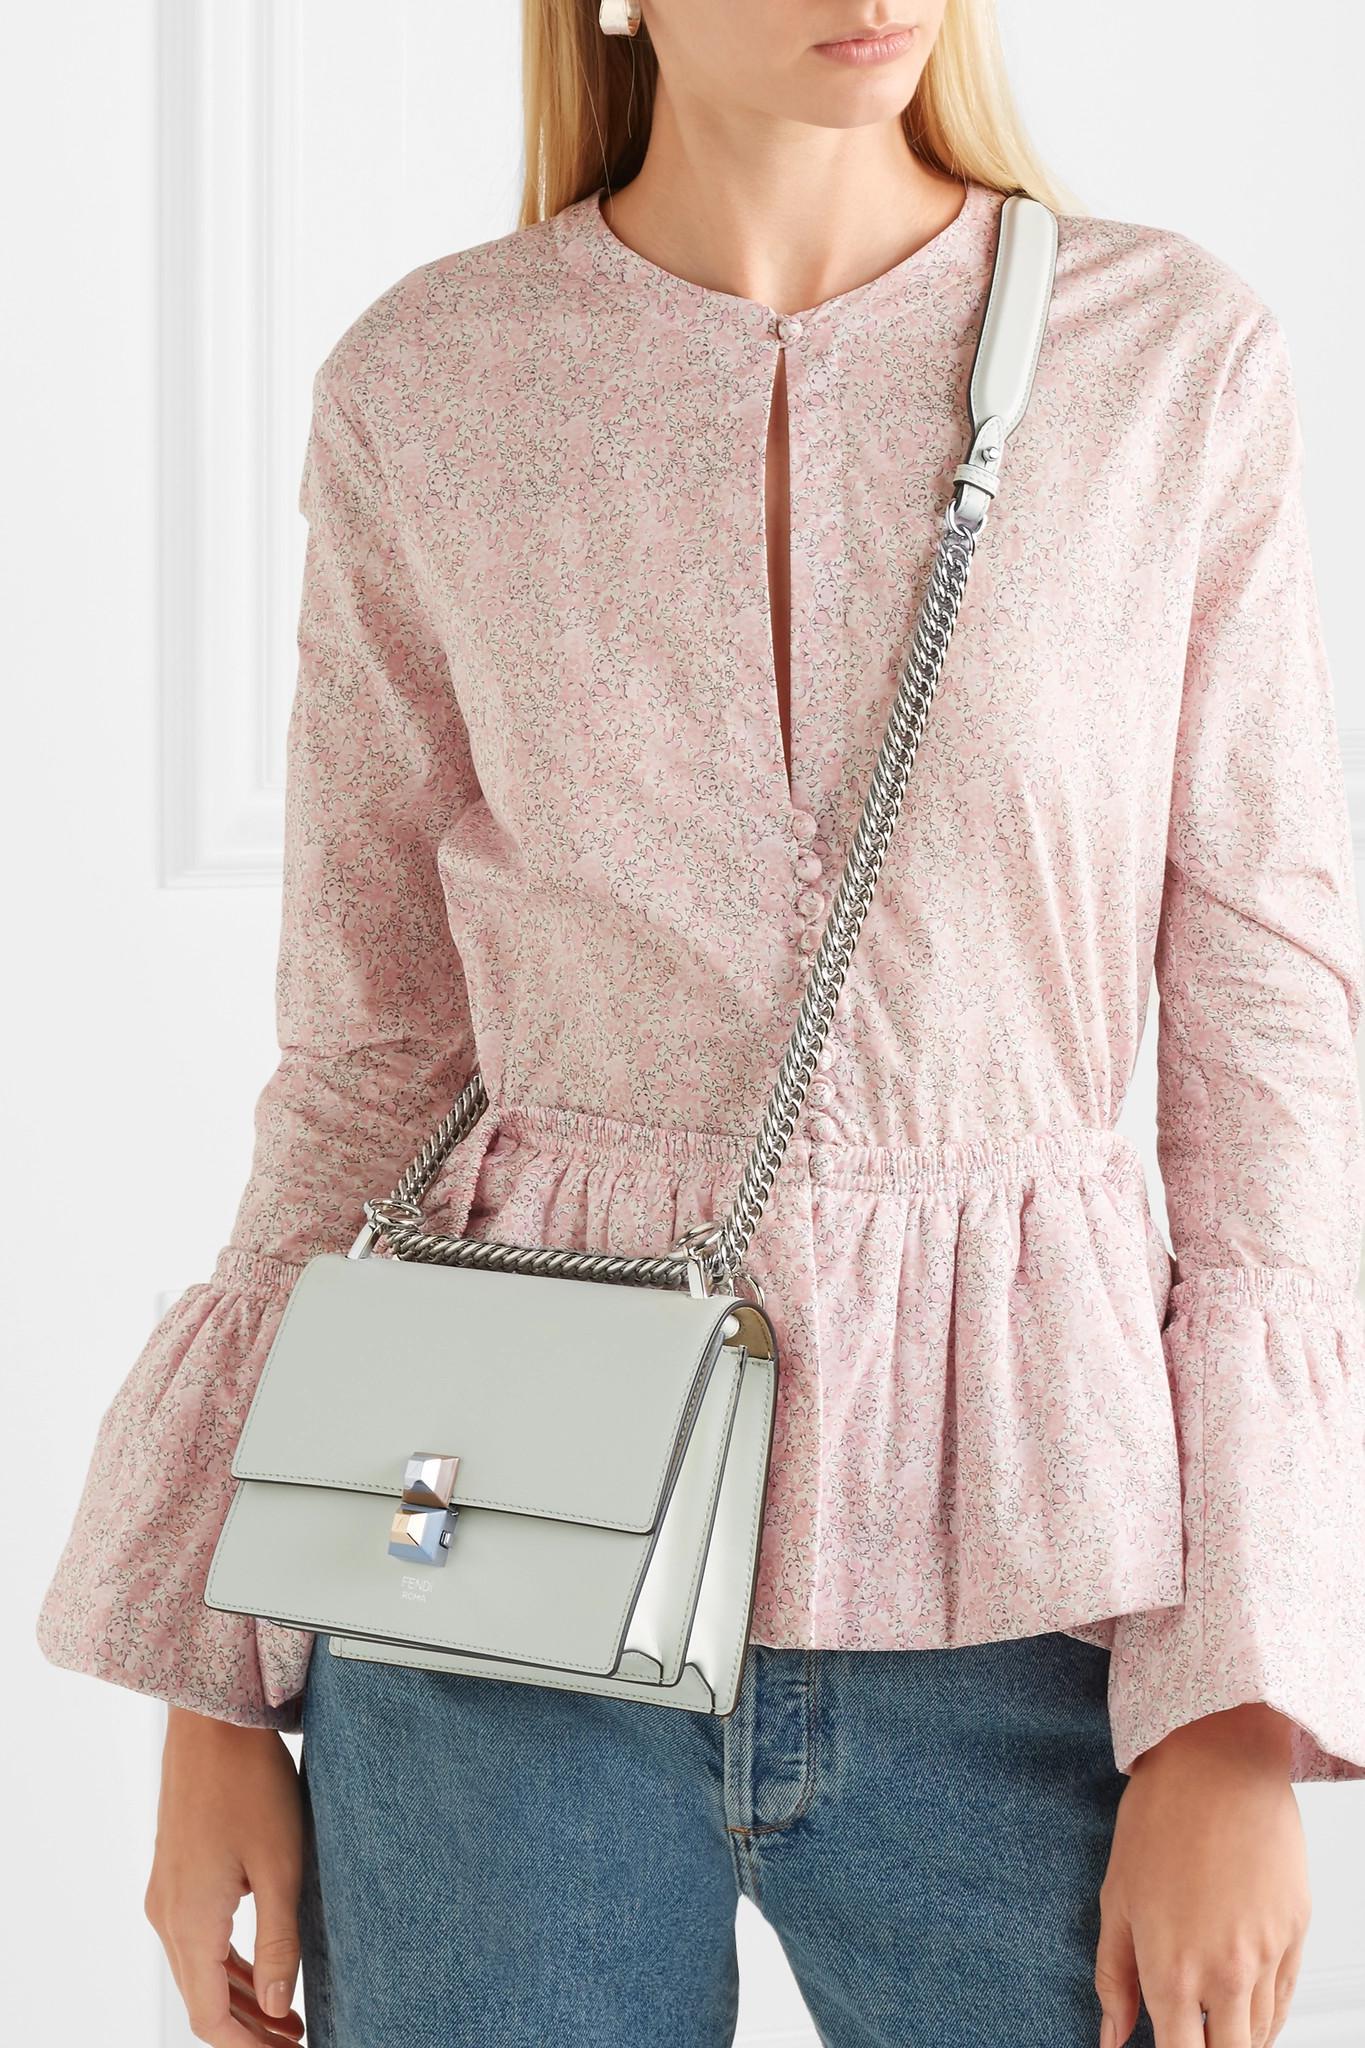 48019b415e Lyst - Fendi Kan I Leather Shoulder Bag in Green